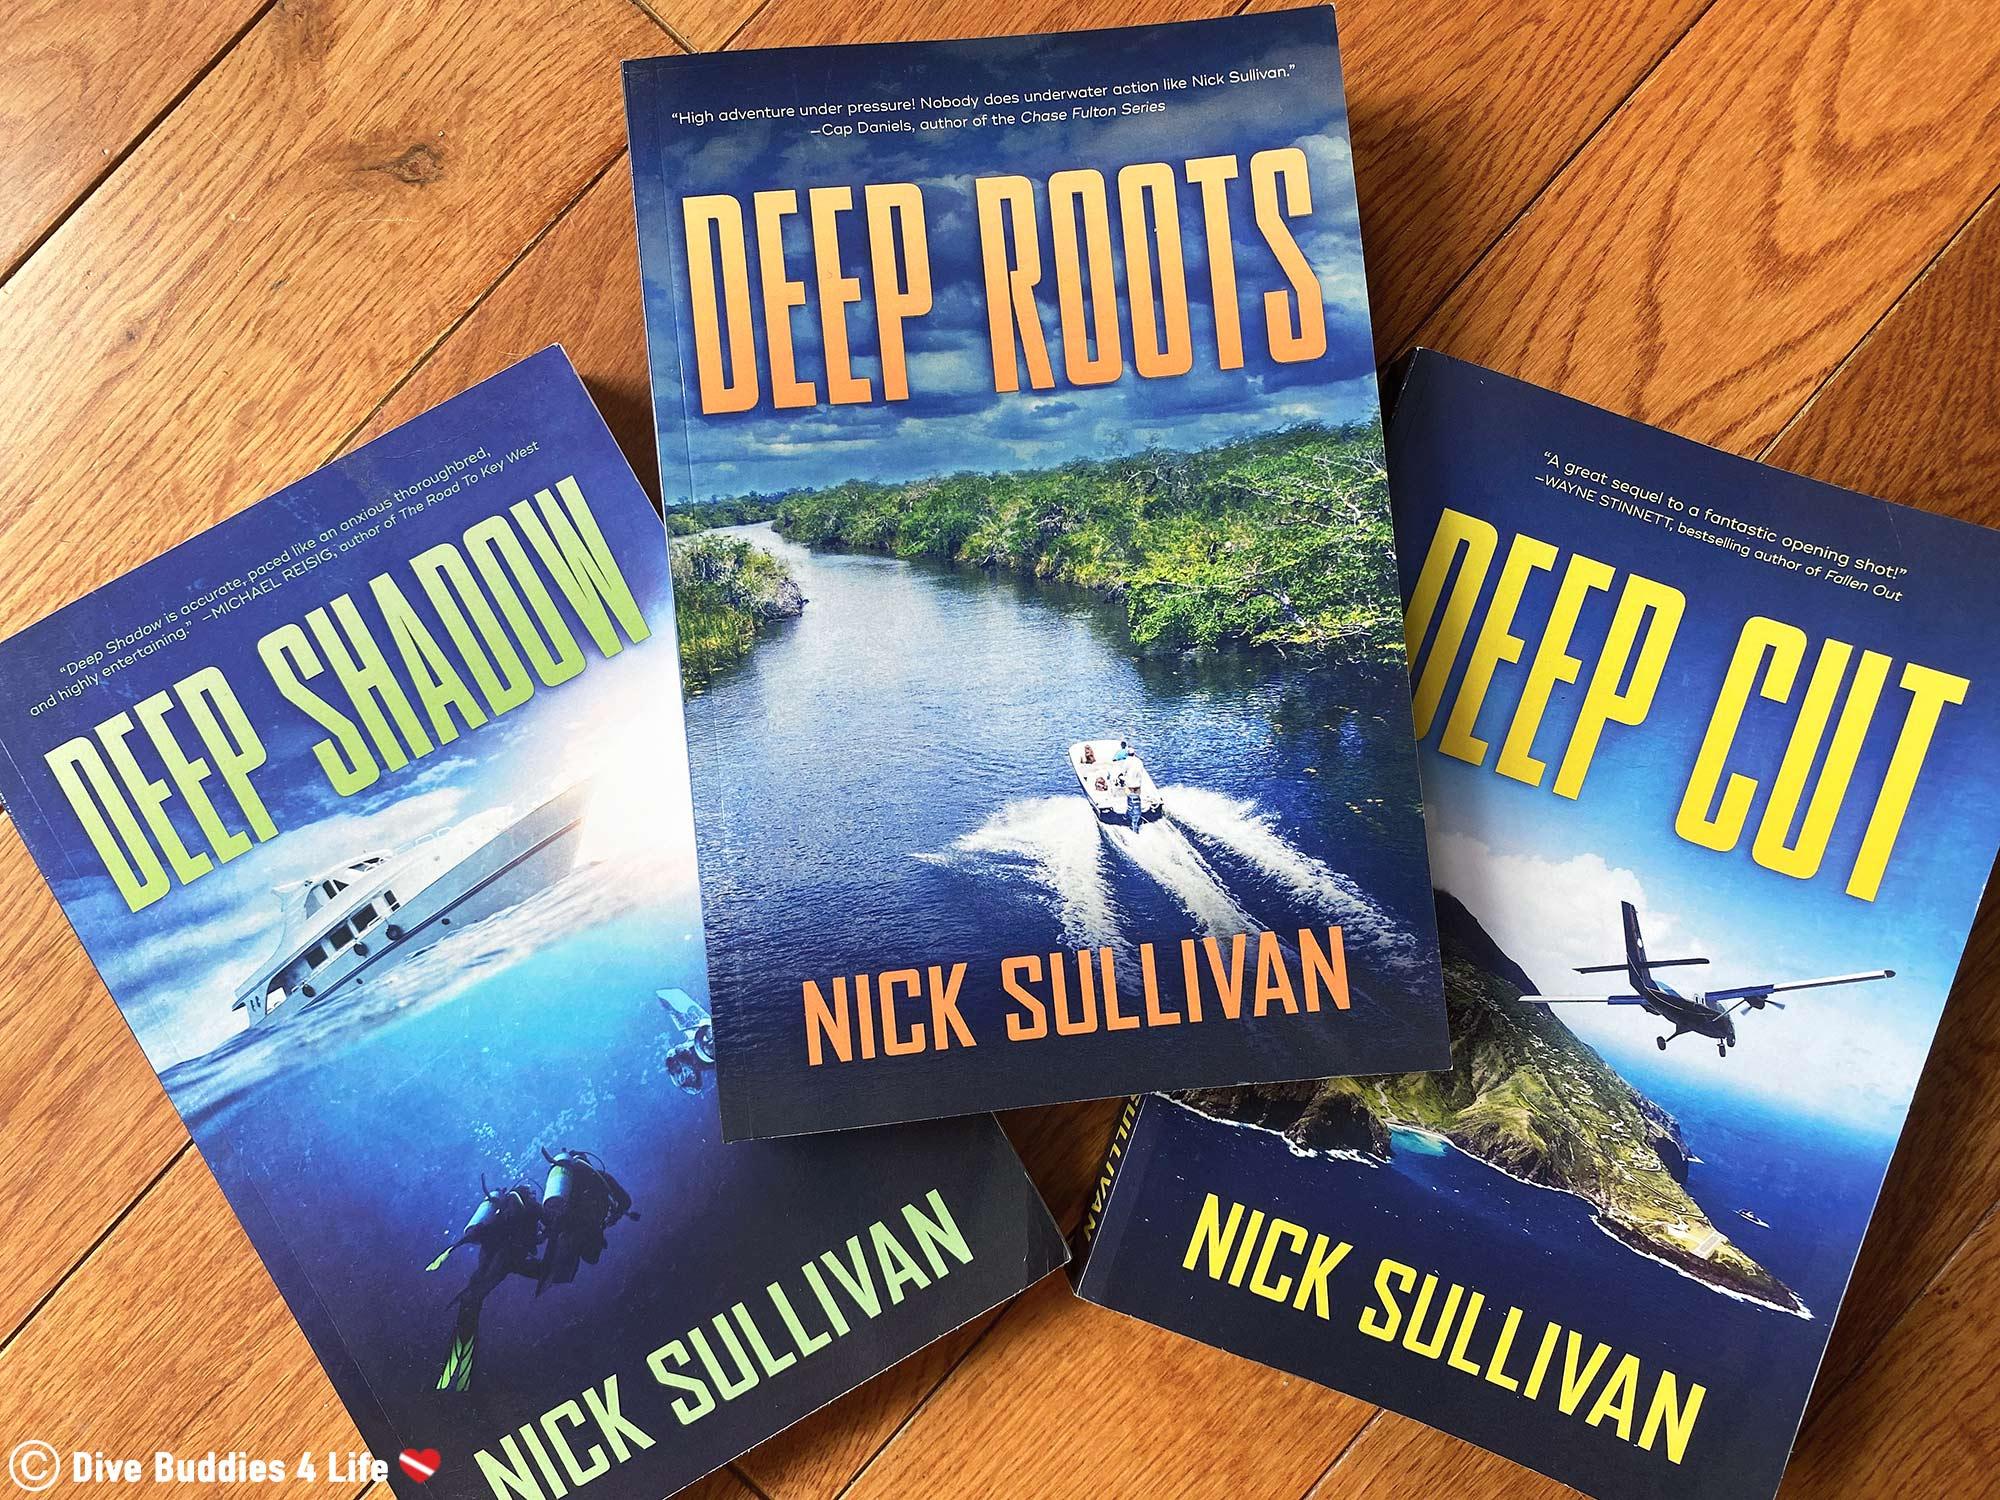 The Third Book Of The Deep Scuba Novel Series, Deep Roots By Nick Sullivan